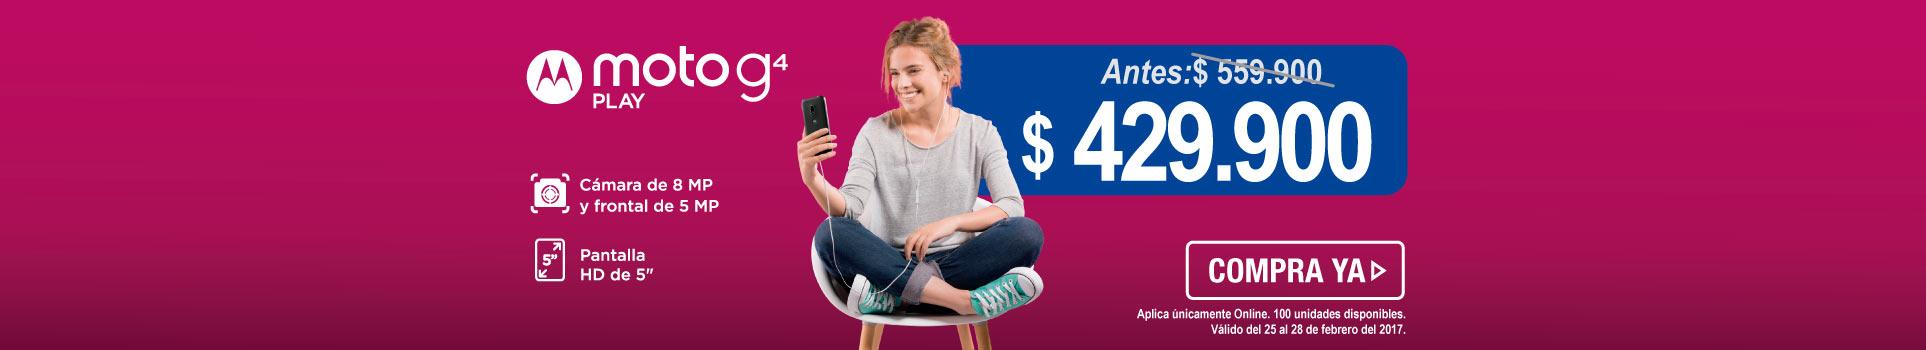 Celular 4G MOTOROLA Moto G4 Play DS - banner opcional